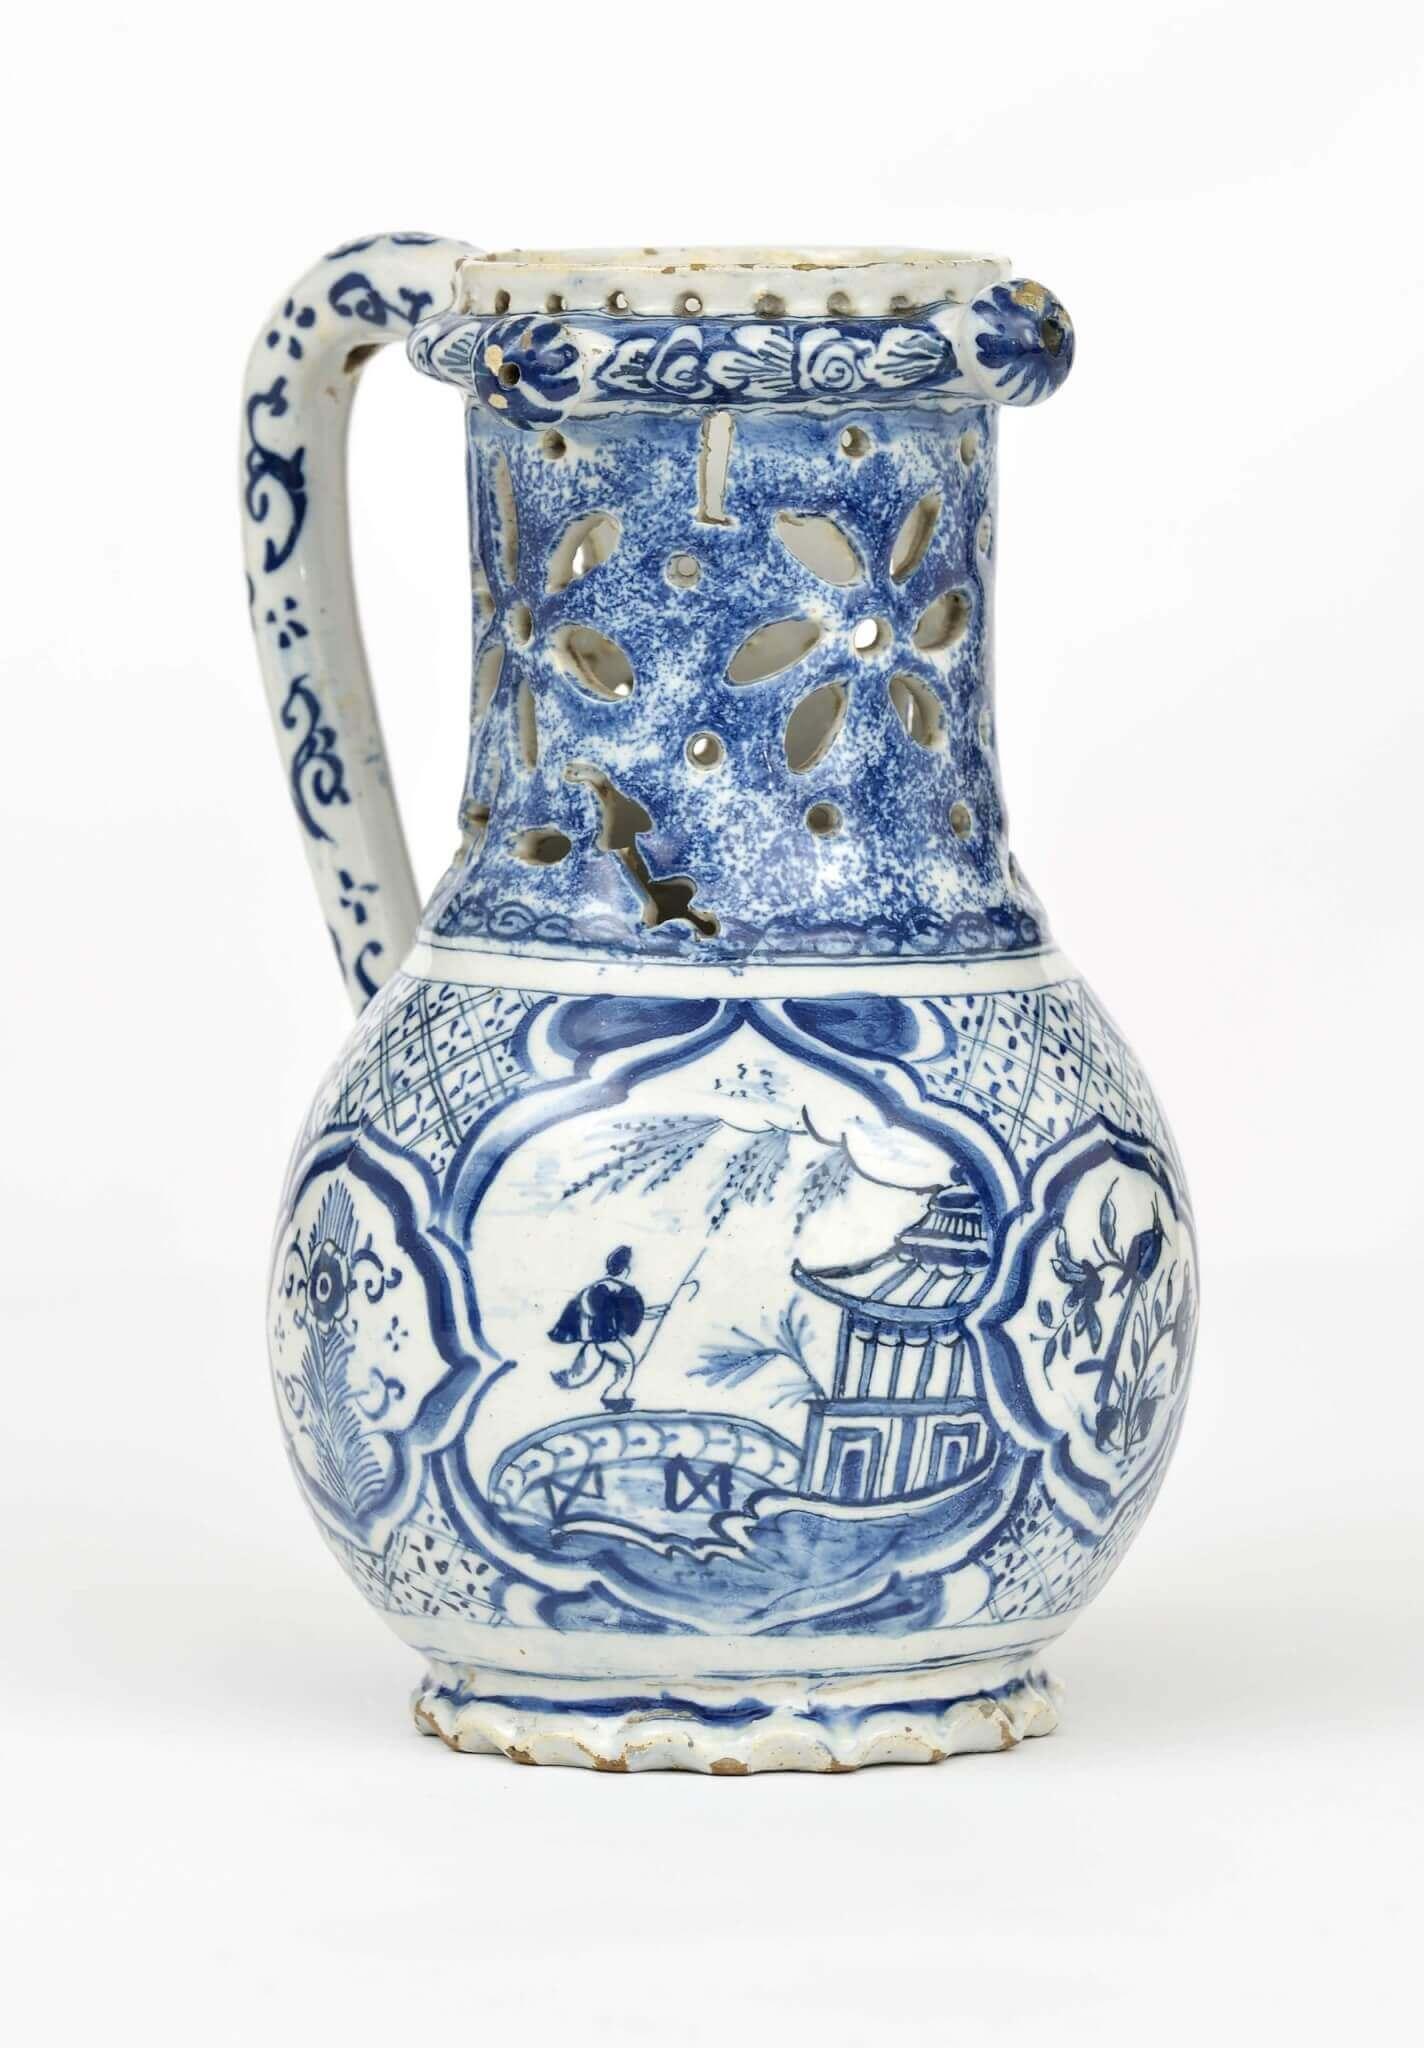 Blue and white Delftware puzzle jug